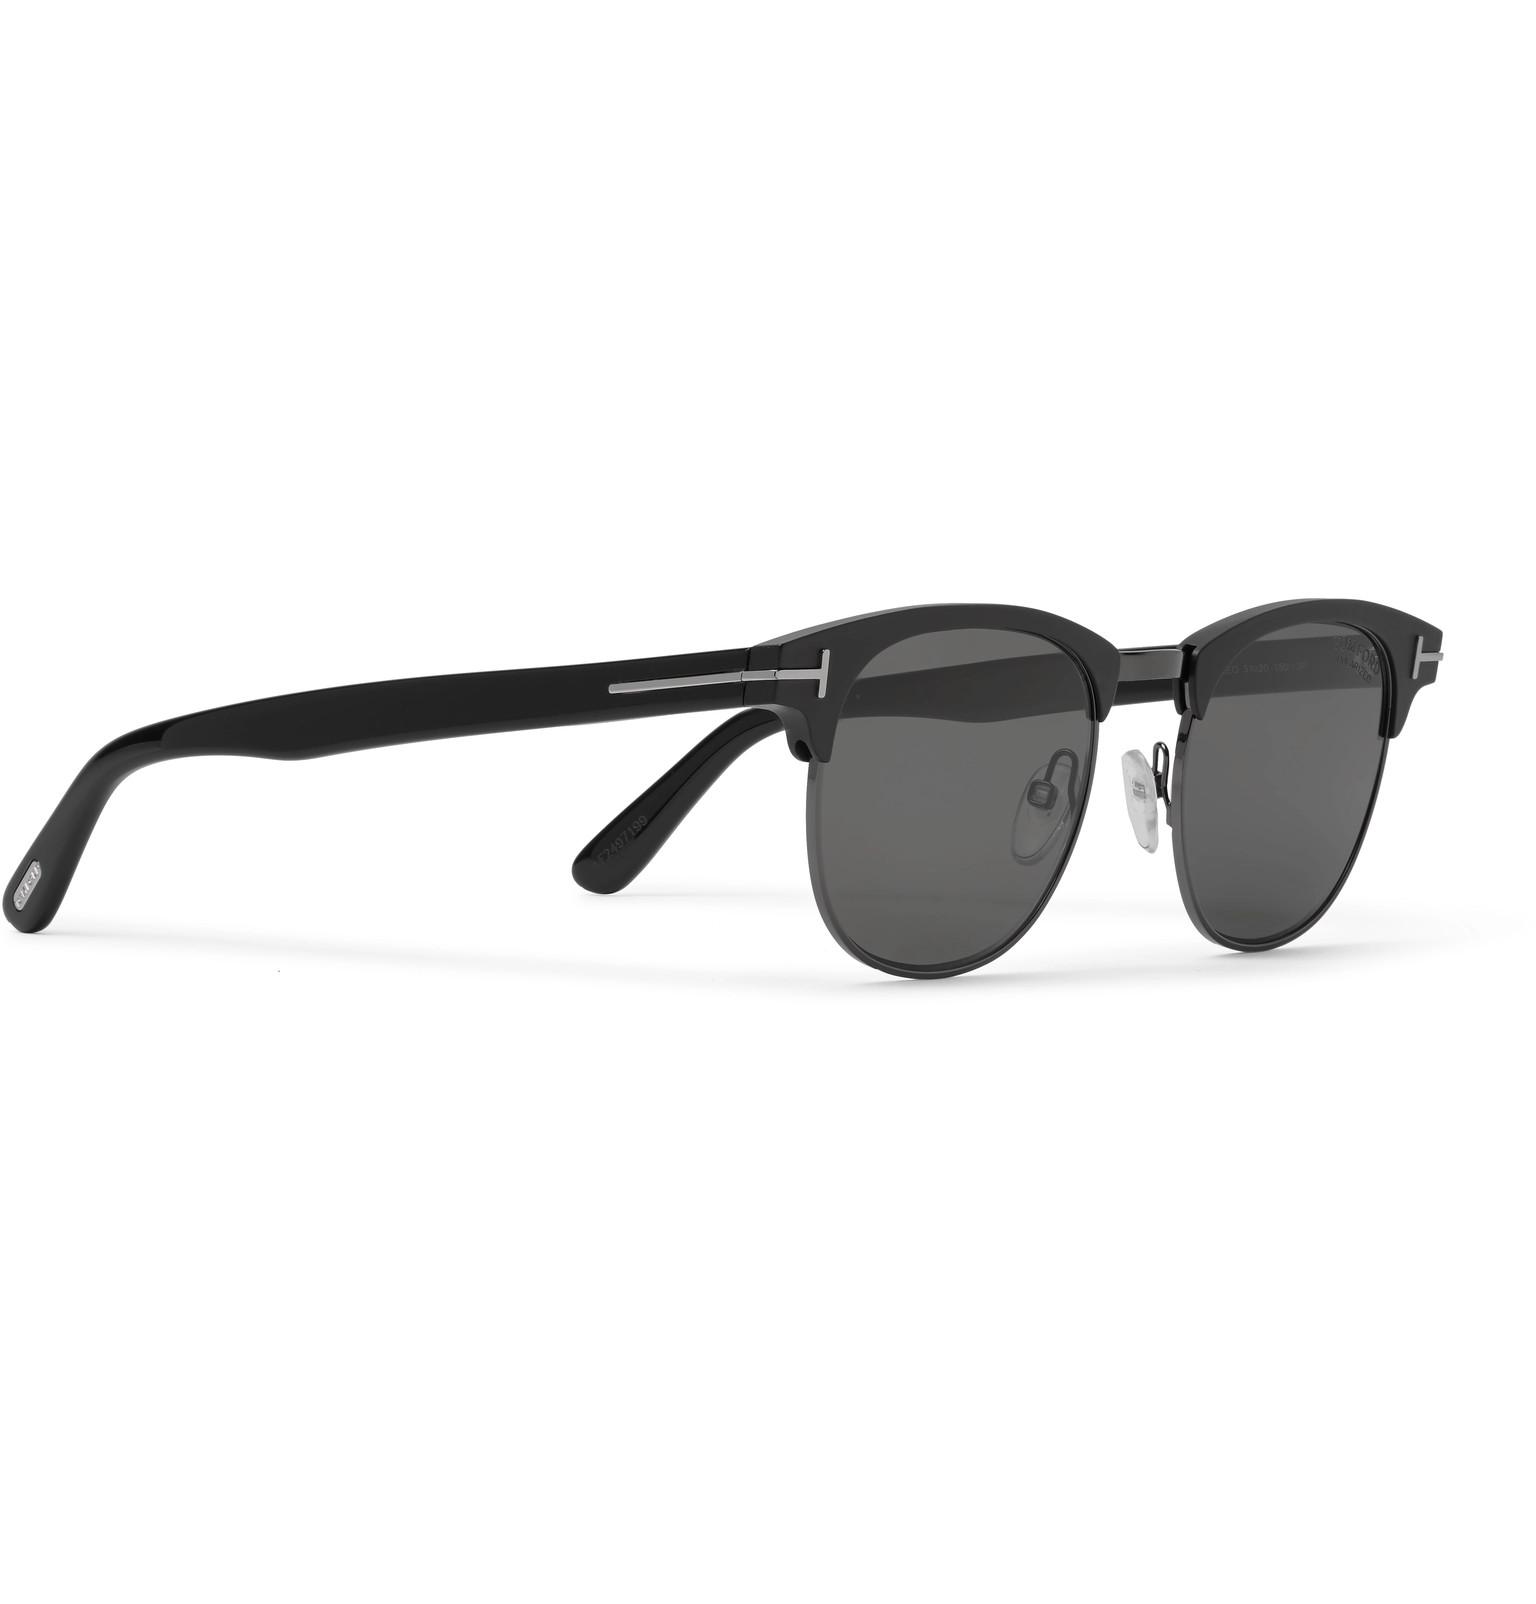 b55c2cd819f TOM FORDLaurent D-Frame Acetate and Gunmetal-Tone Polarised Sunglasses